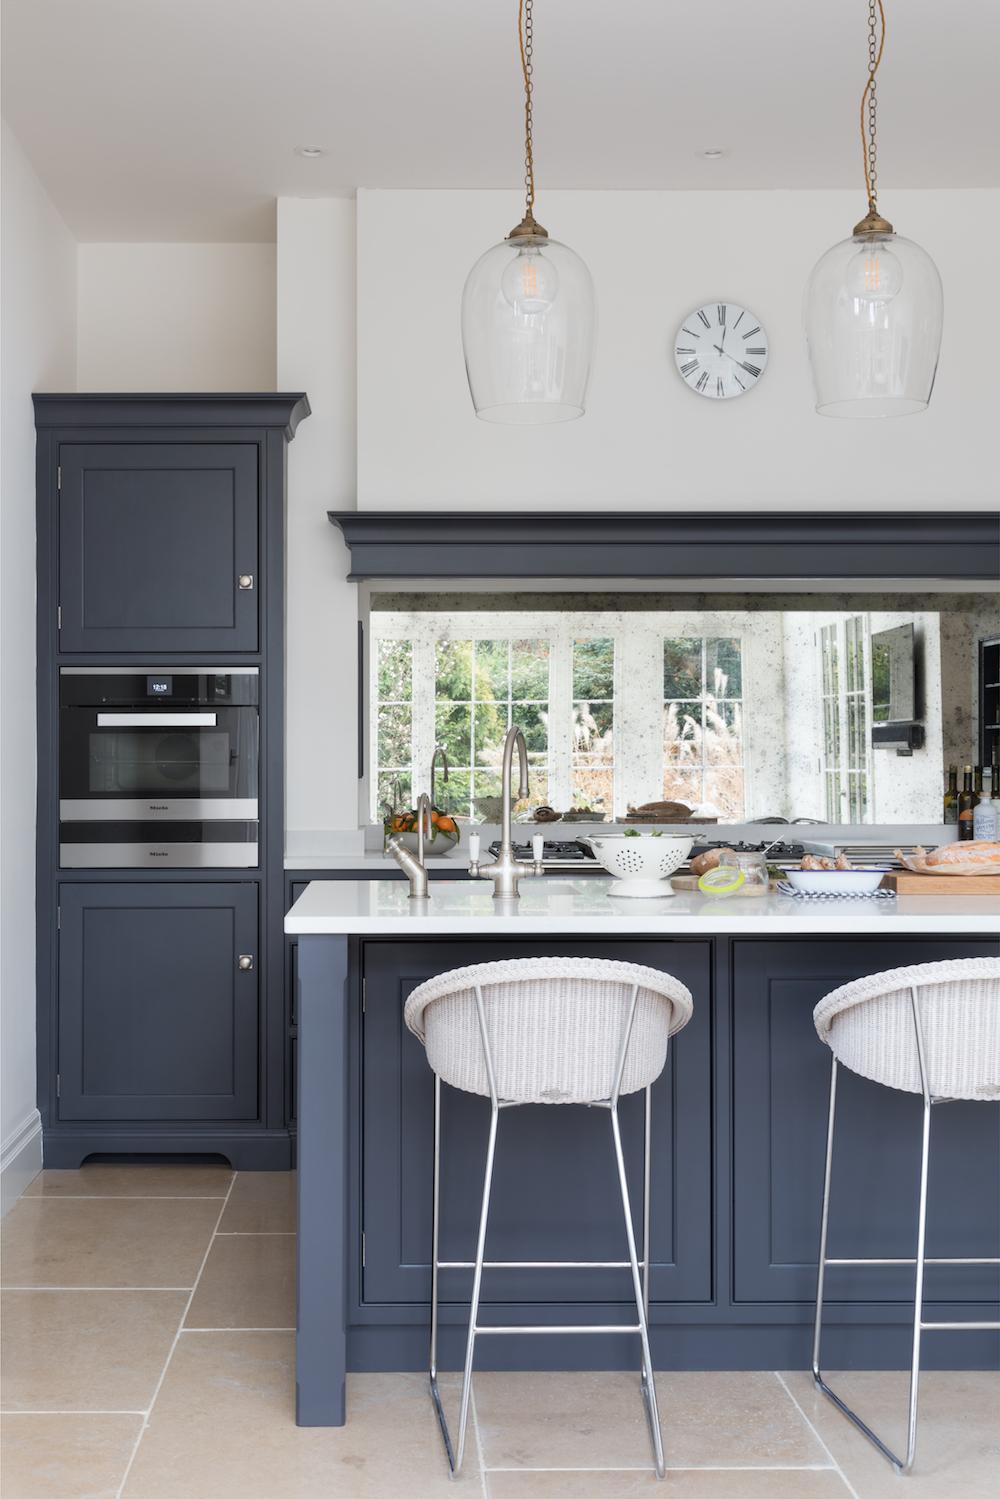 Oak-Lodge-Norfolk-Humphrey-Munson-Kitchen-Low-Res-11 2.jpg